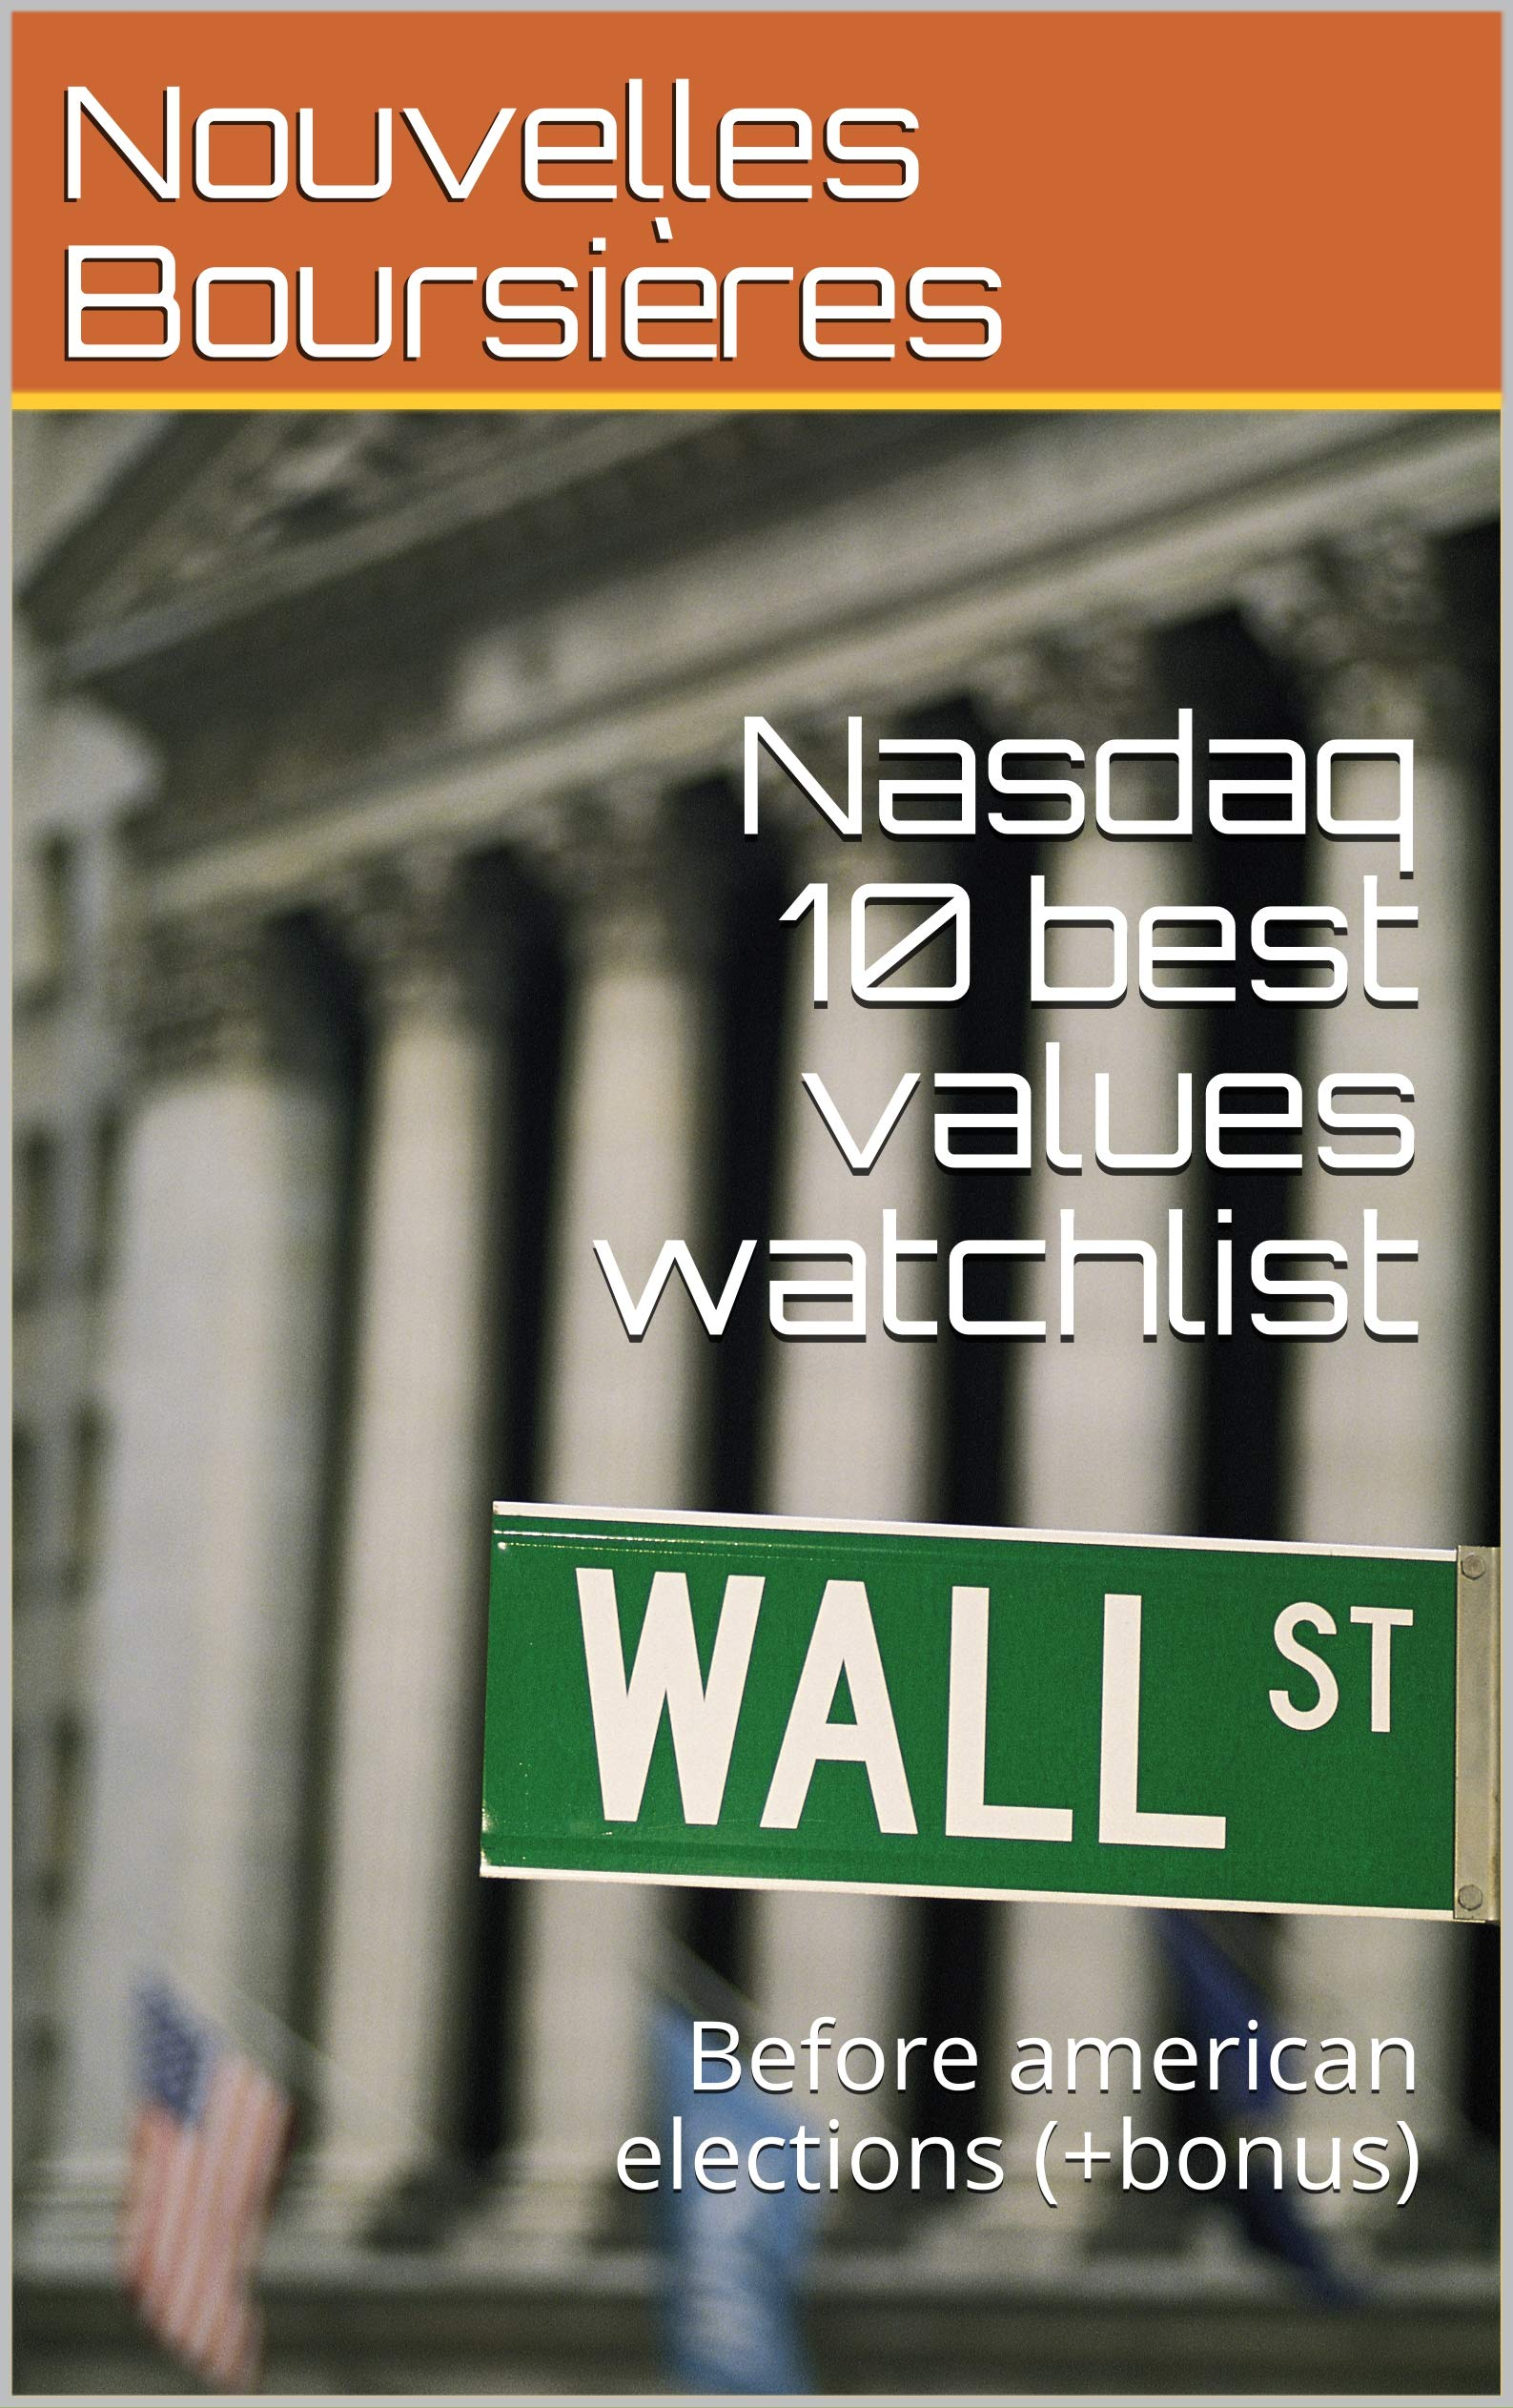 Nasdaq 10 best values watchlist : Before american elections (+bonus)